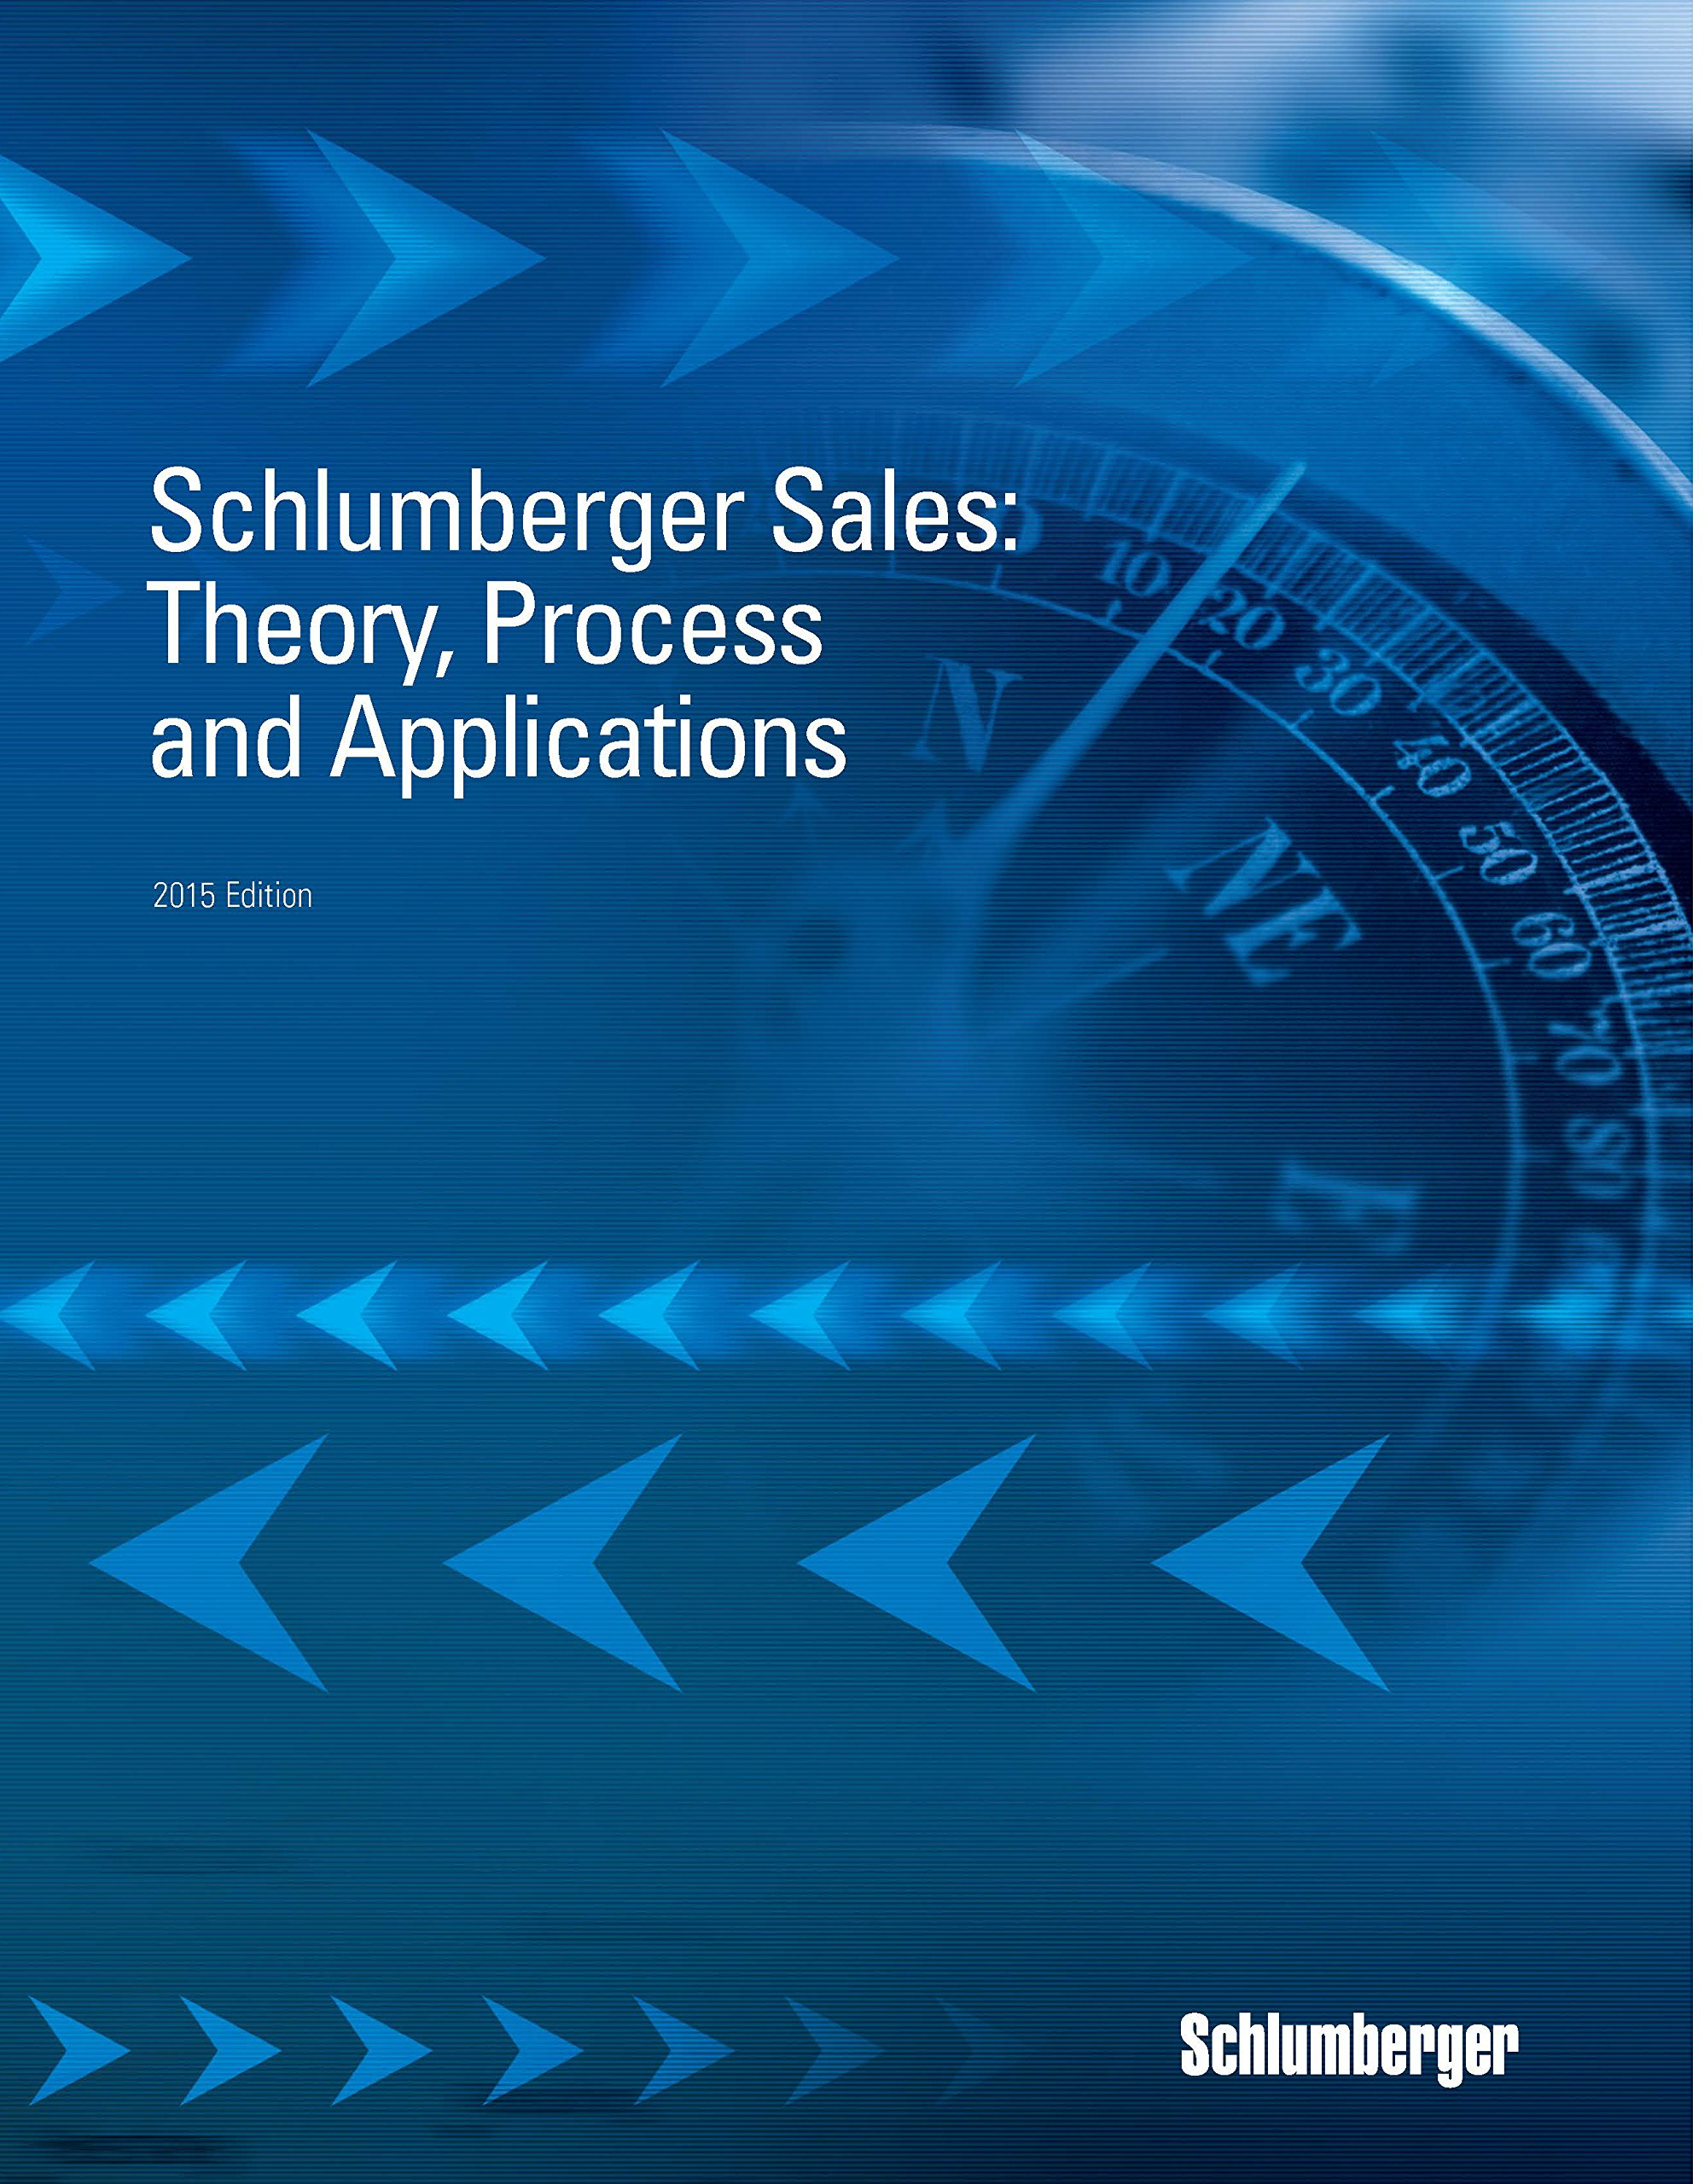 Schlumberger sales theory process an applications jp amlin schlumberger sales theory process an applications jp amlin 9789881408808 amazon books fandeluxe Gallery